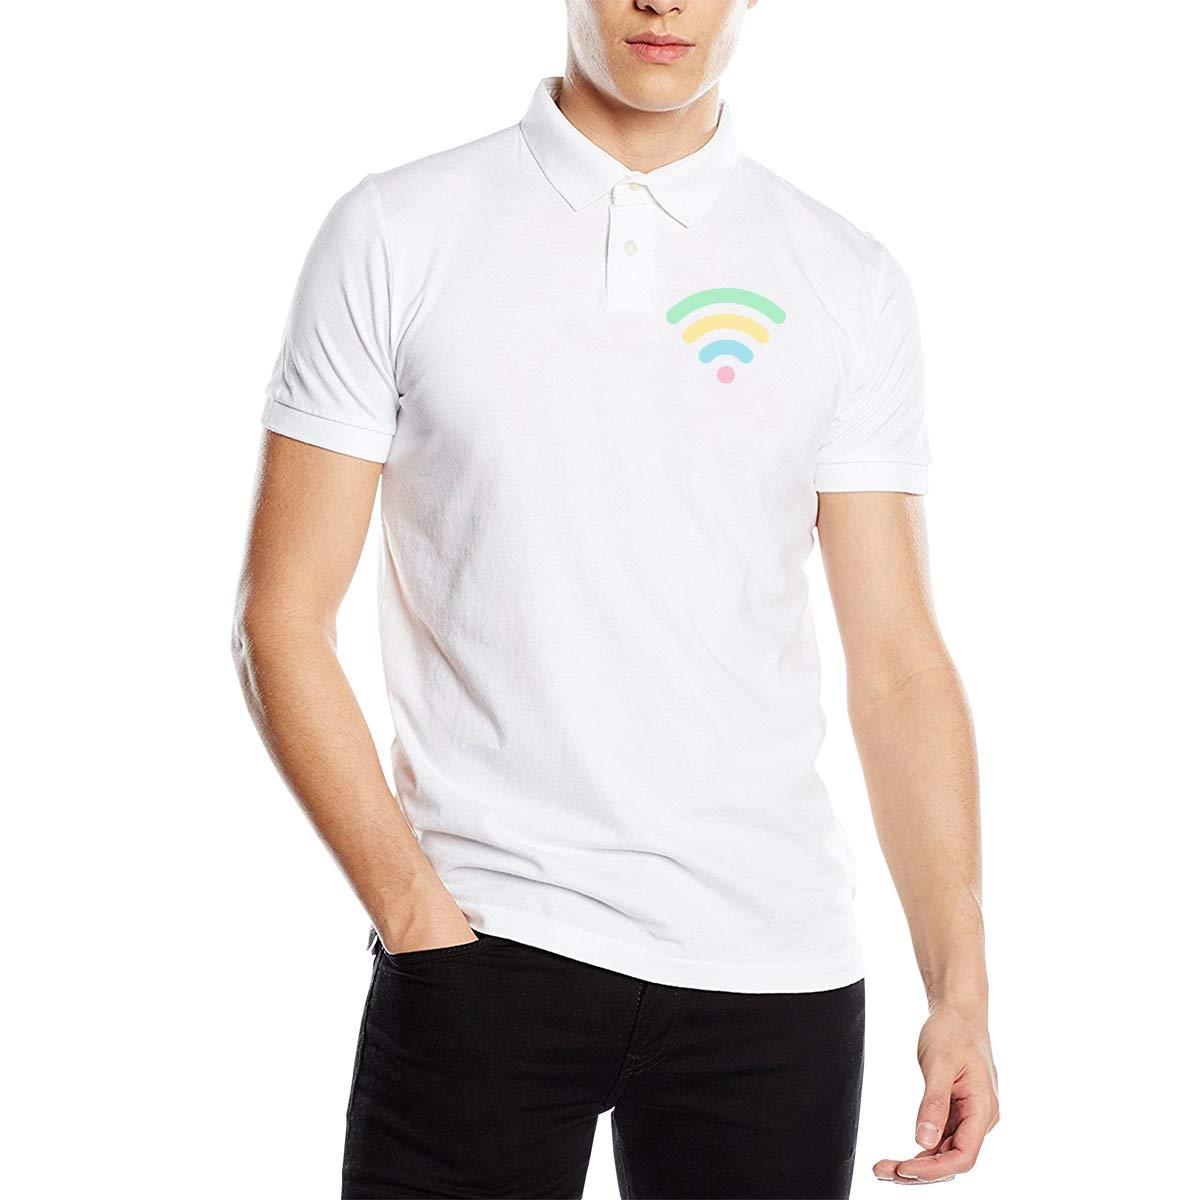 Q64 Wi-Fi Mens Short Sleeves Polo Tee Shirt